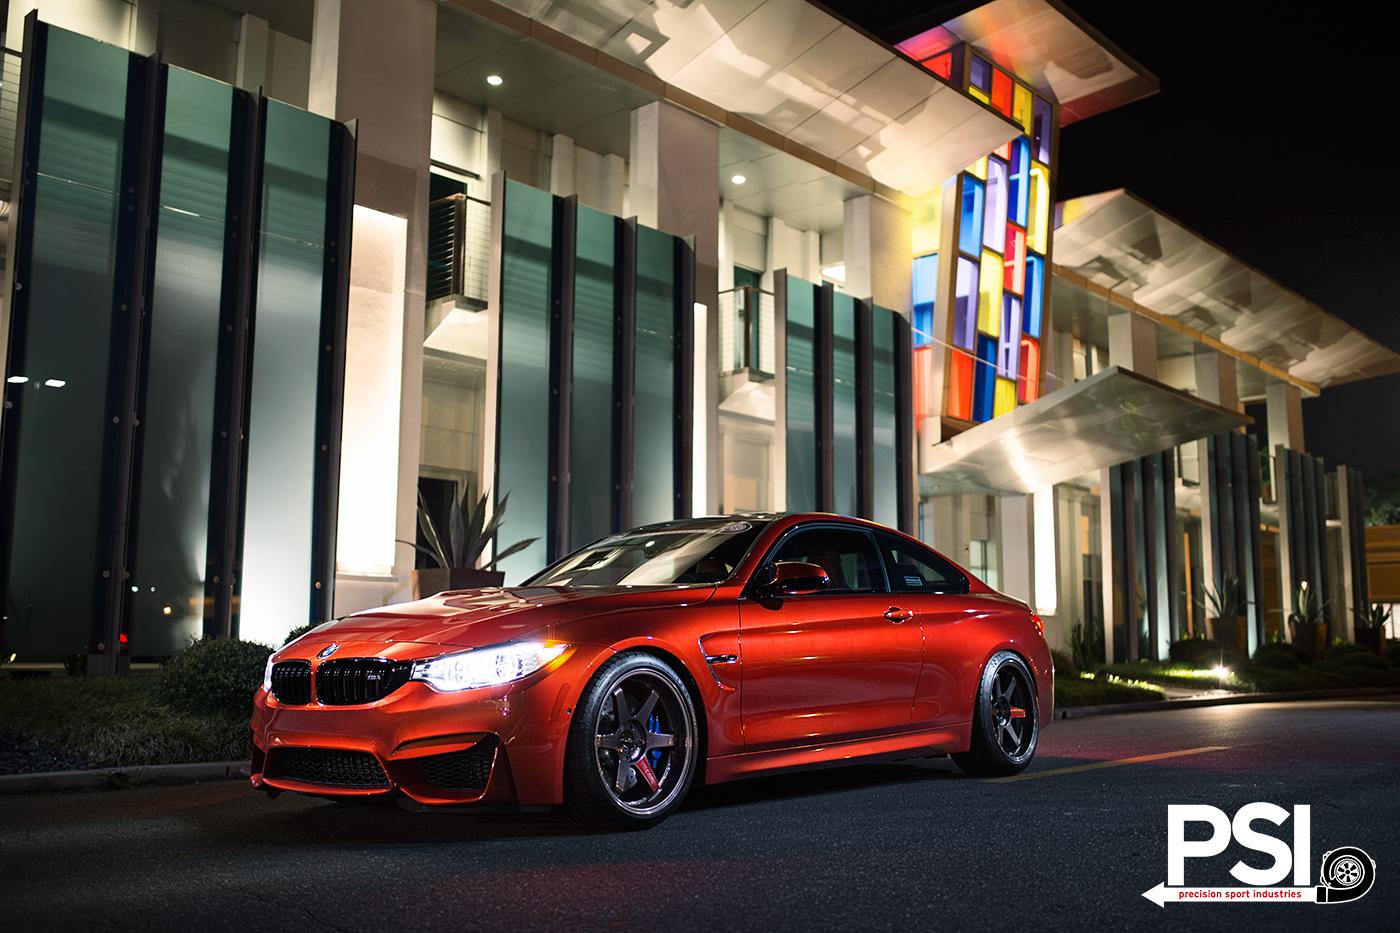 PSIs Sakhir Orange BMW M4 Makes some Friends  autoevolution